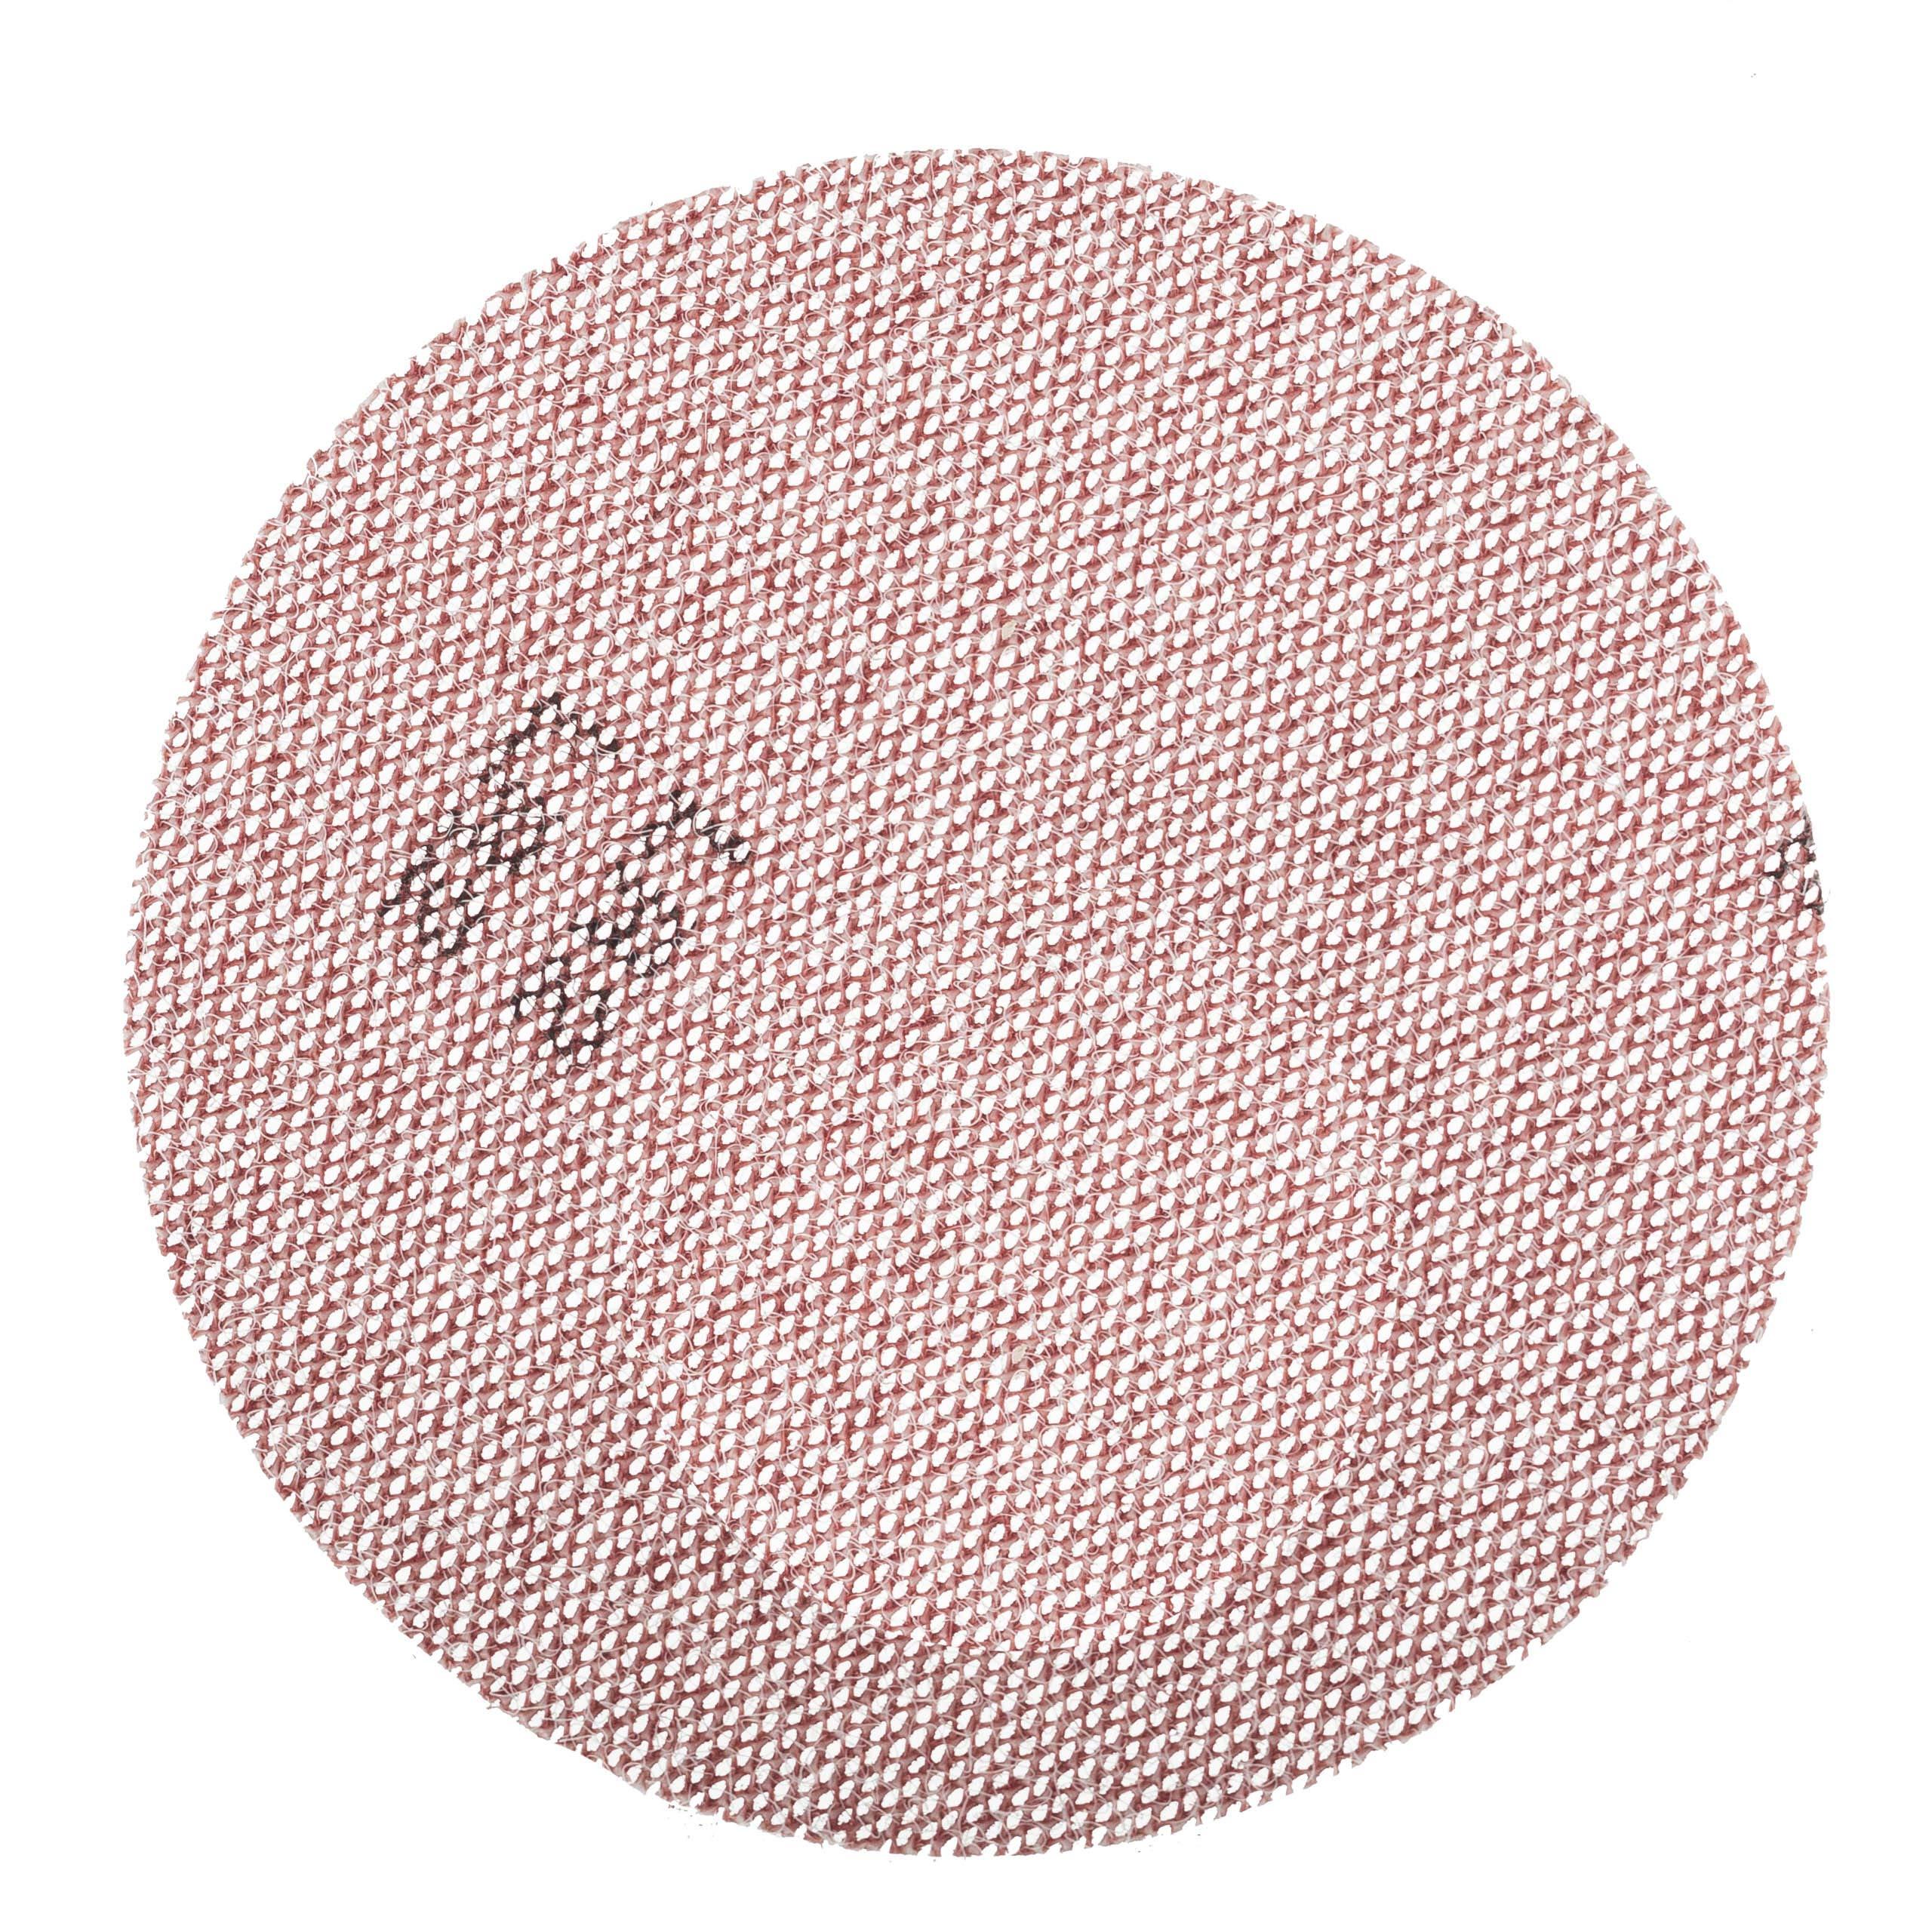 5 Grip Disc Grit 400 Abrasives Sunmight 82116 Sun Net